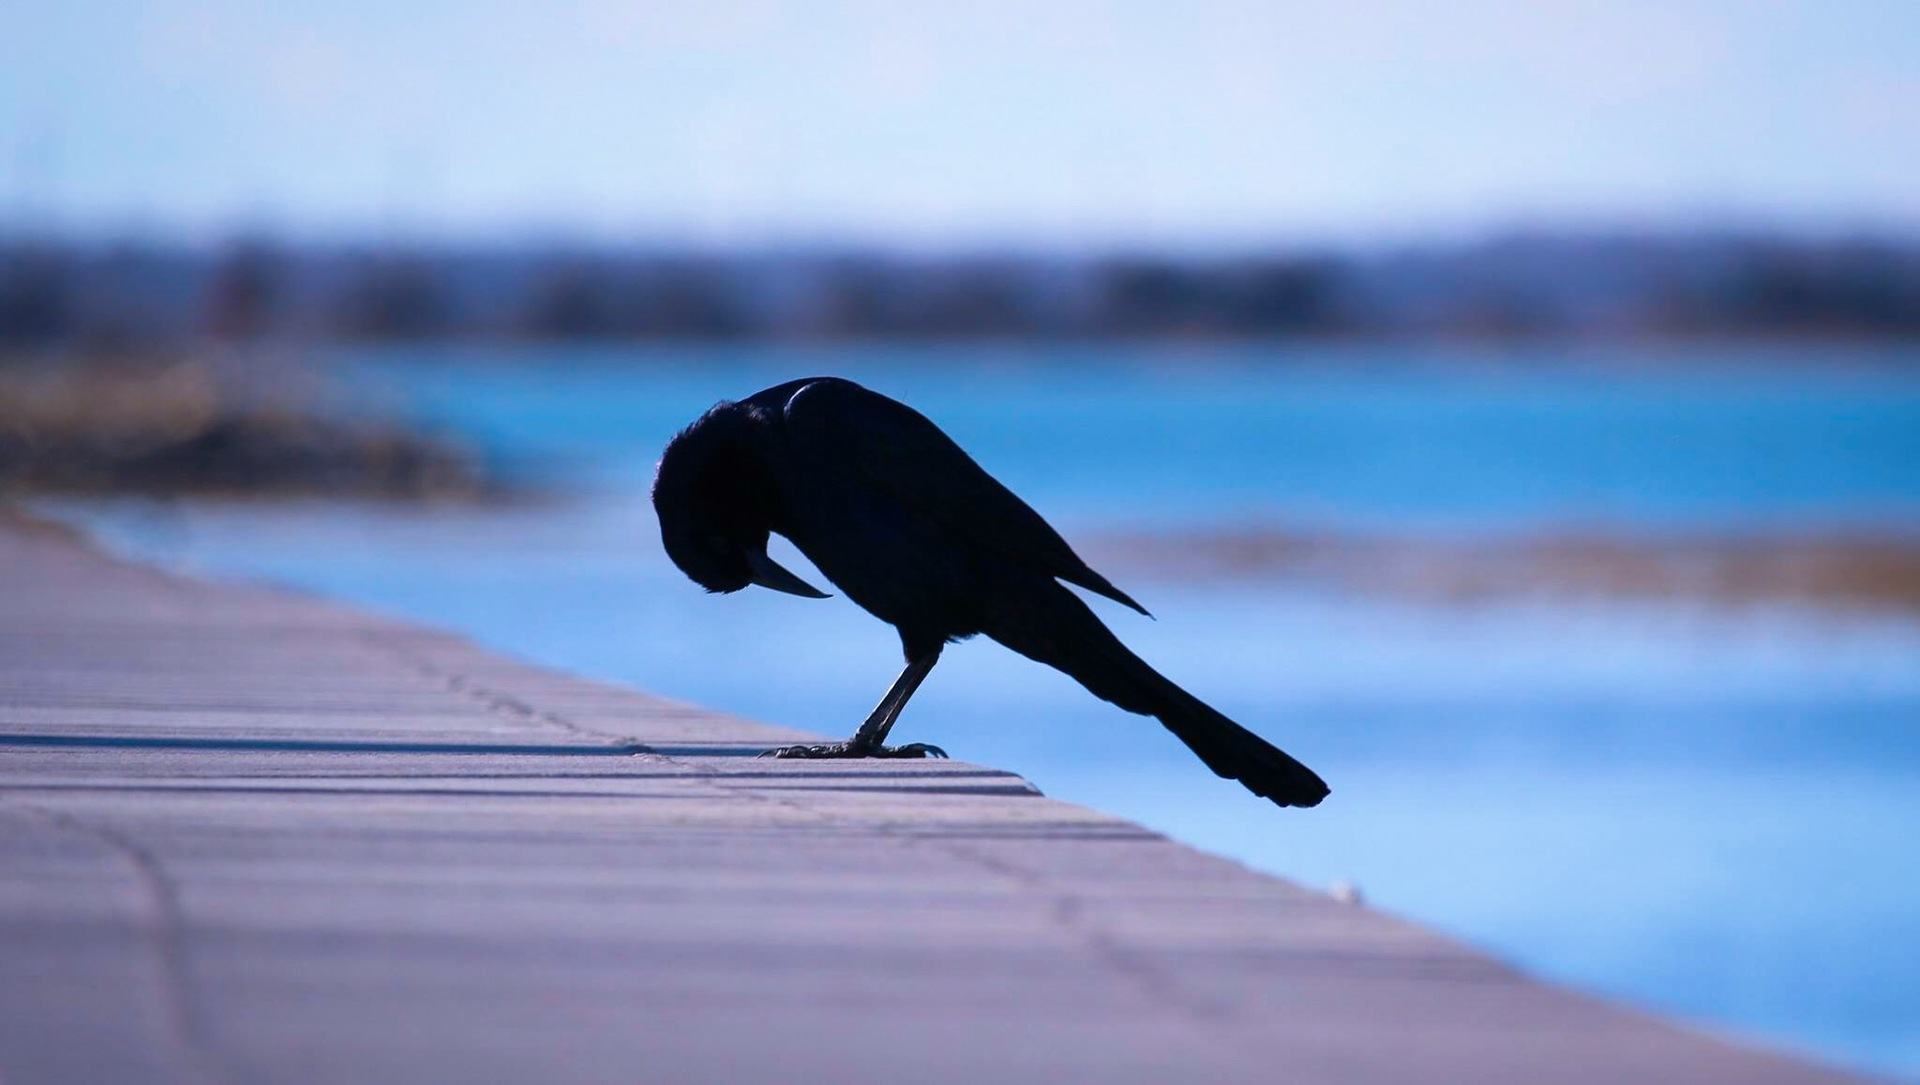 Black bird by the bay, Wildwood, New Jersey